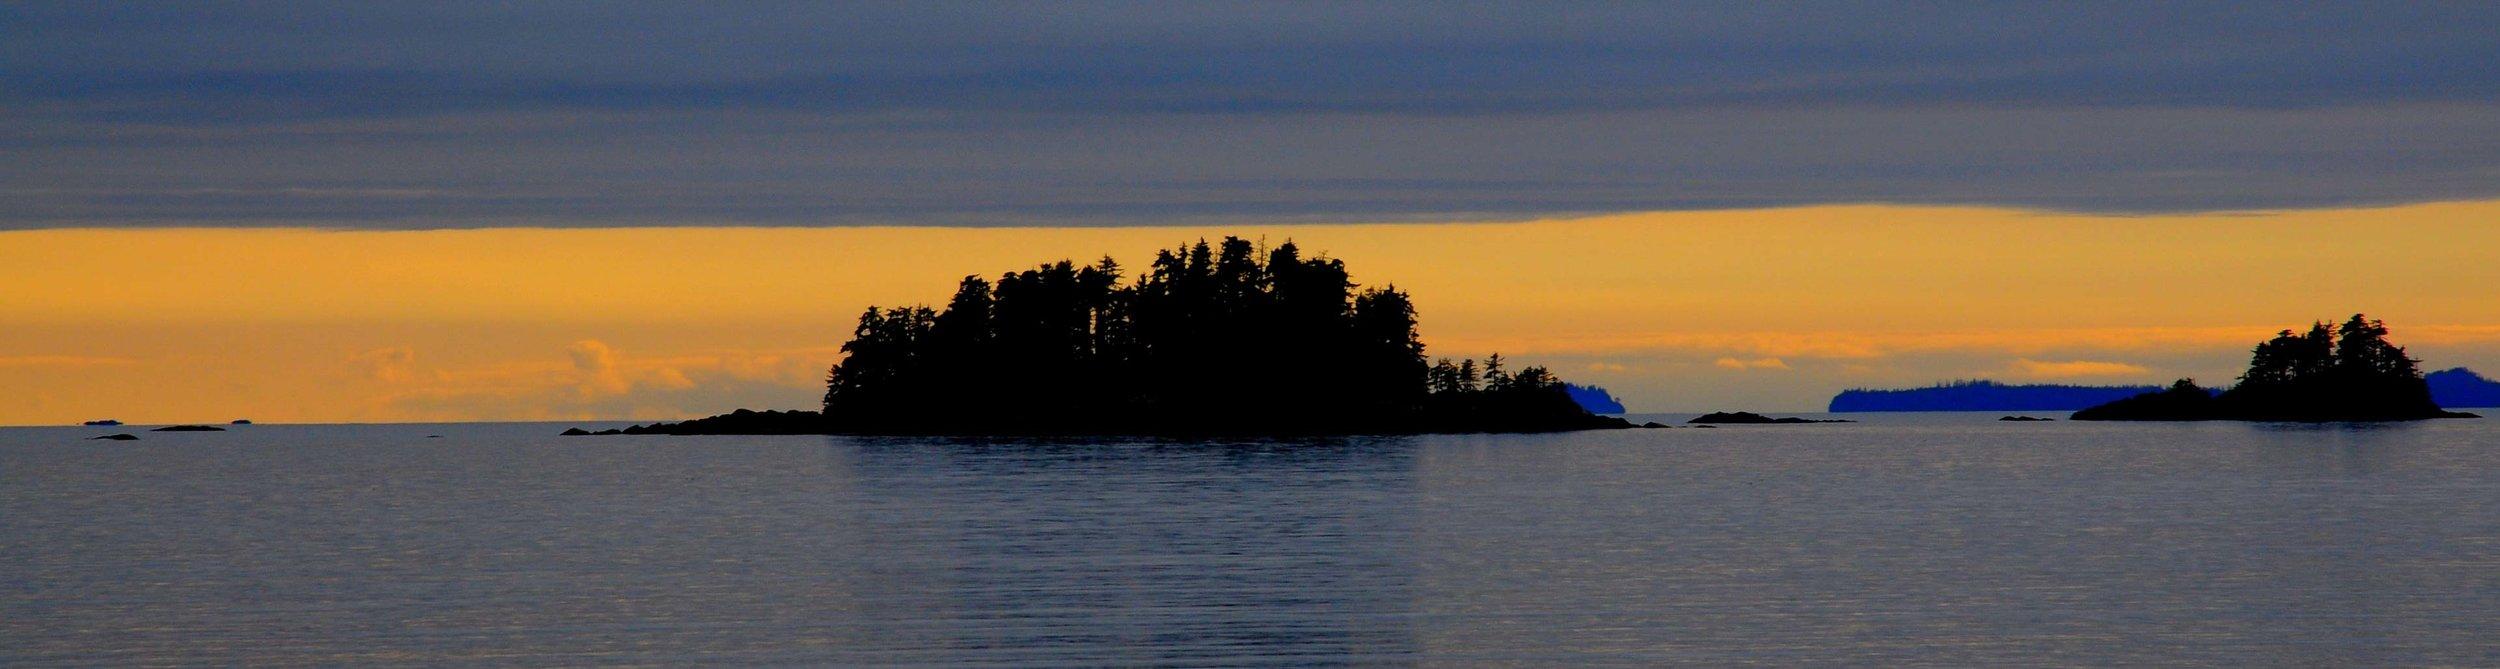 Sunset. Inside Passage, Alaska 2011